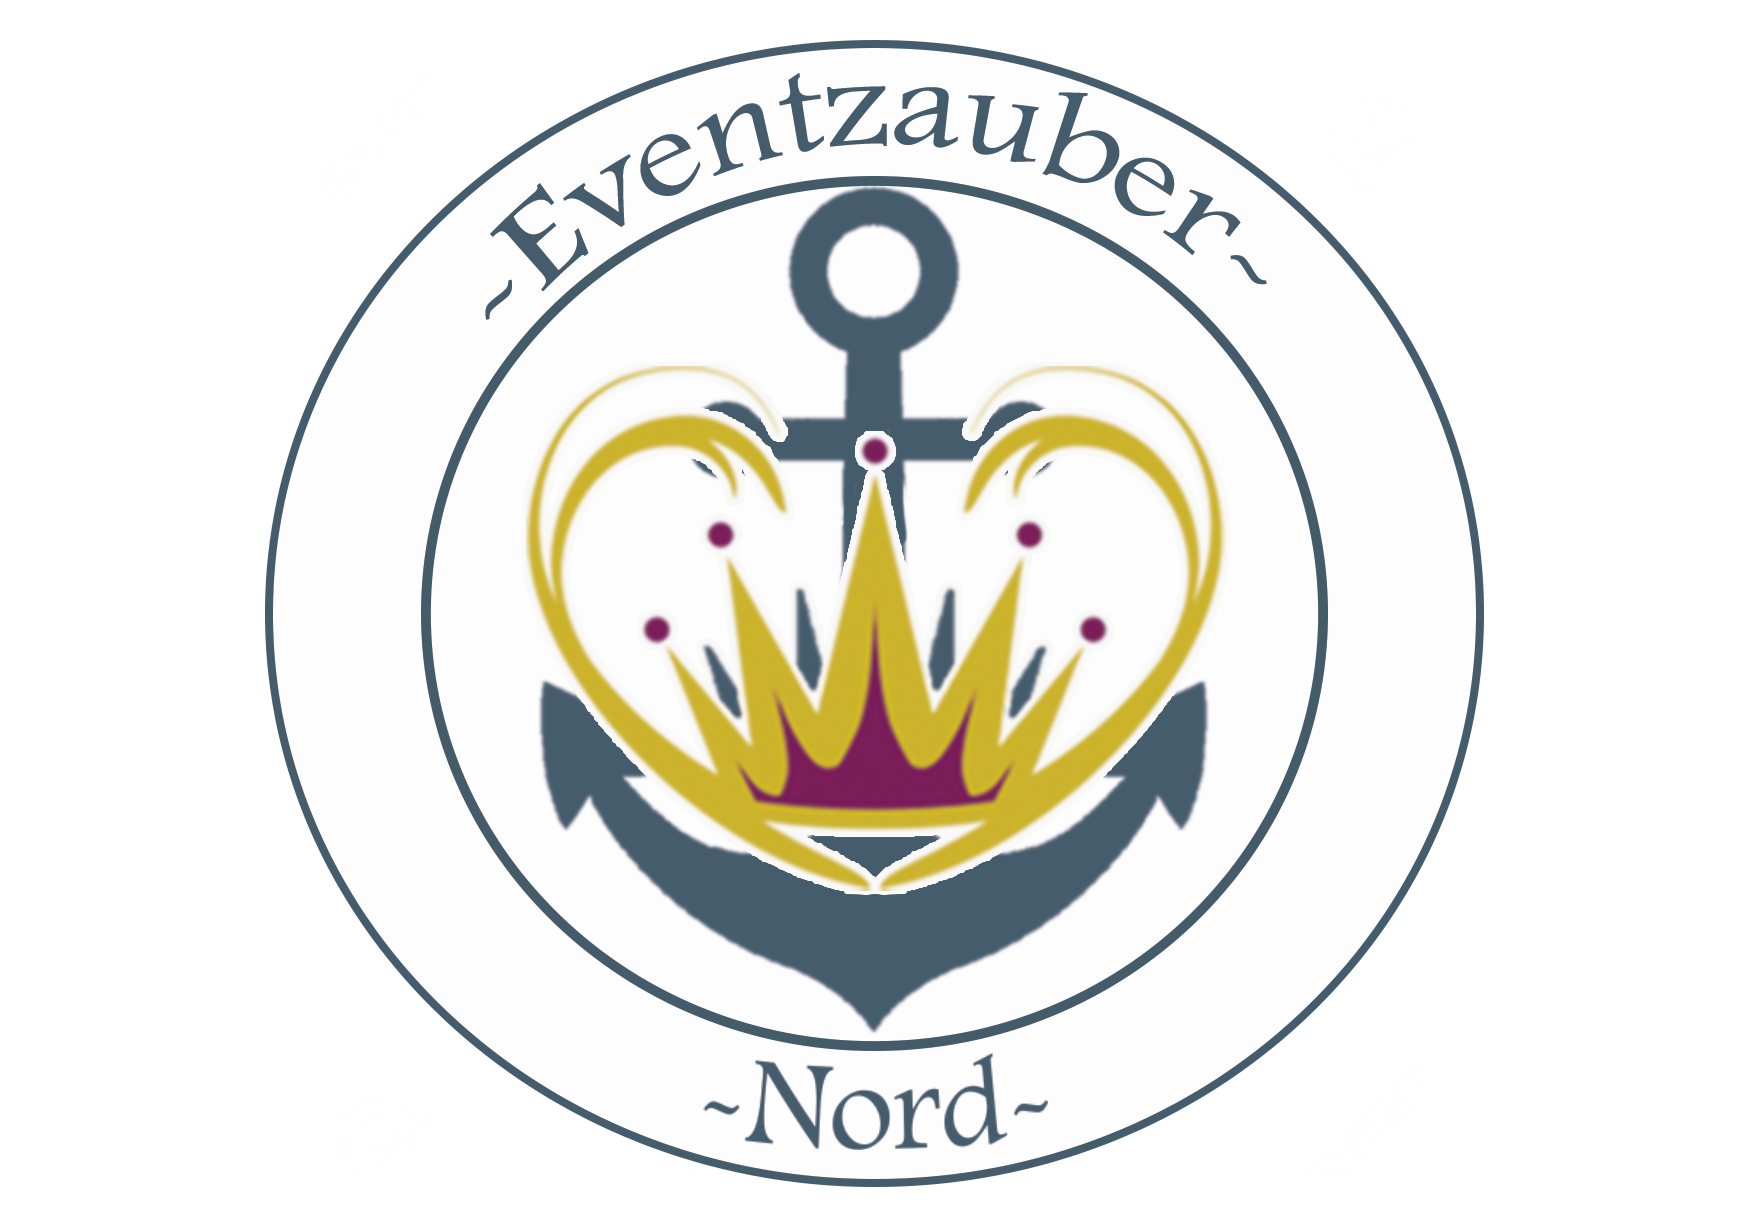 Eventzauber-Nord